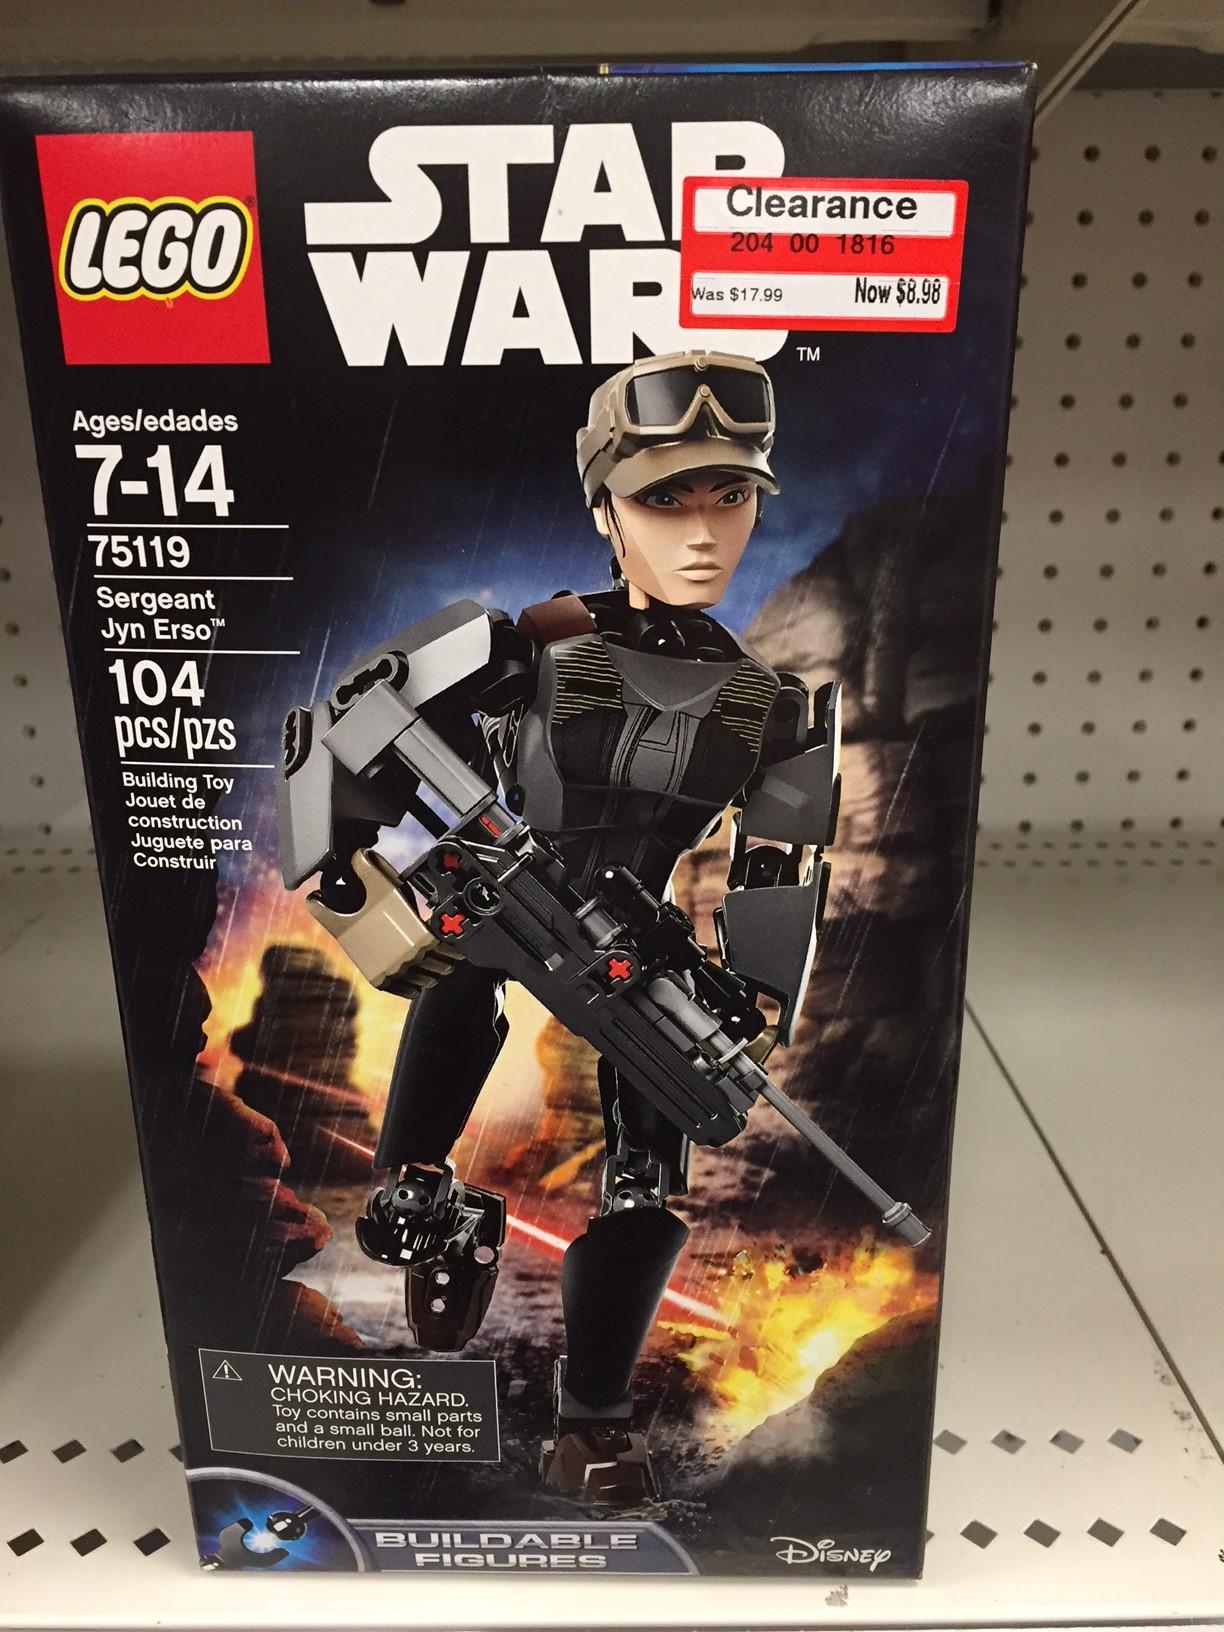 LEGO Star Wars Sergeant Jyn Erso 75119 - Target $8.98 Clearance YMMV